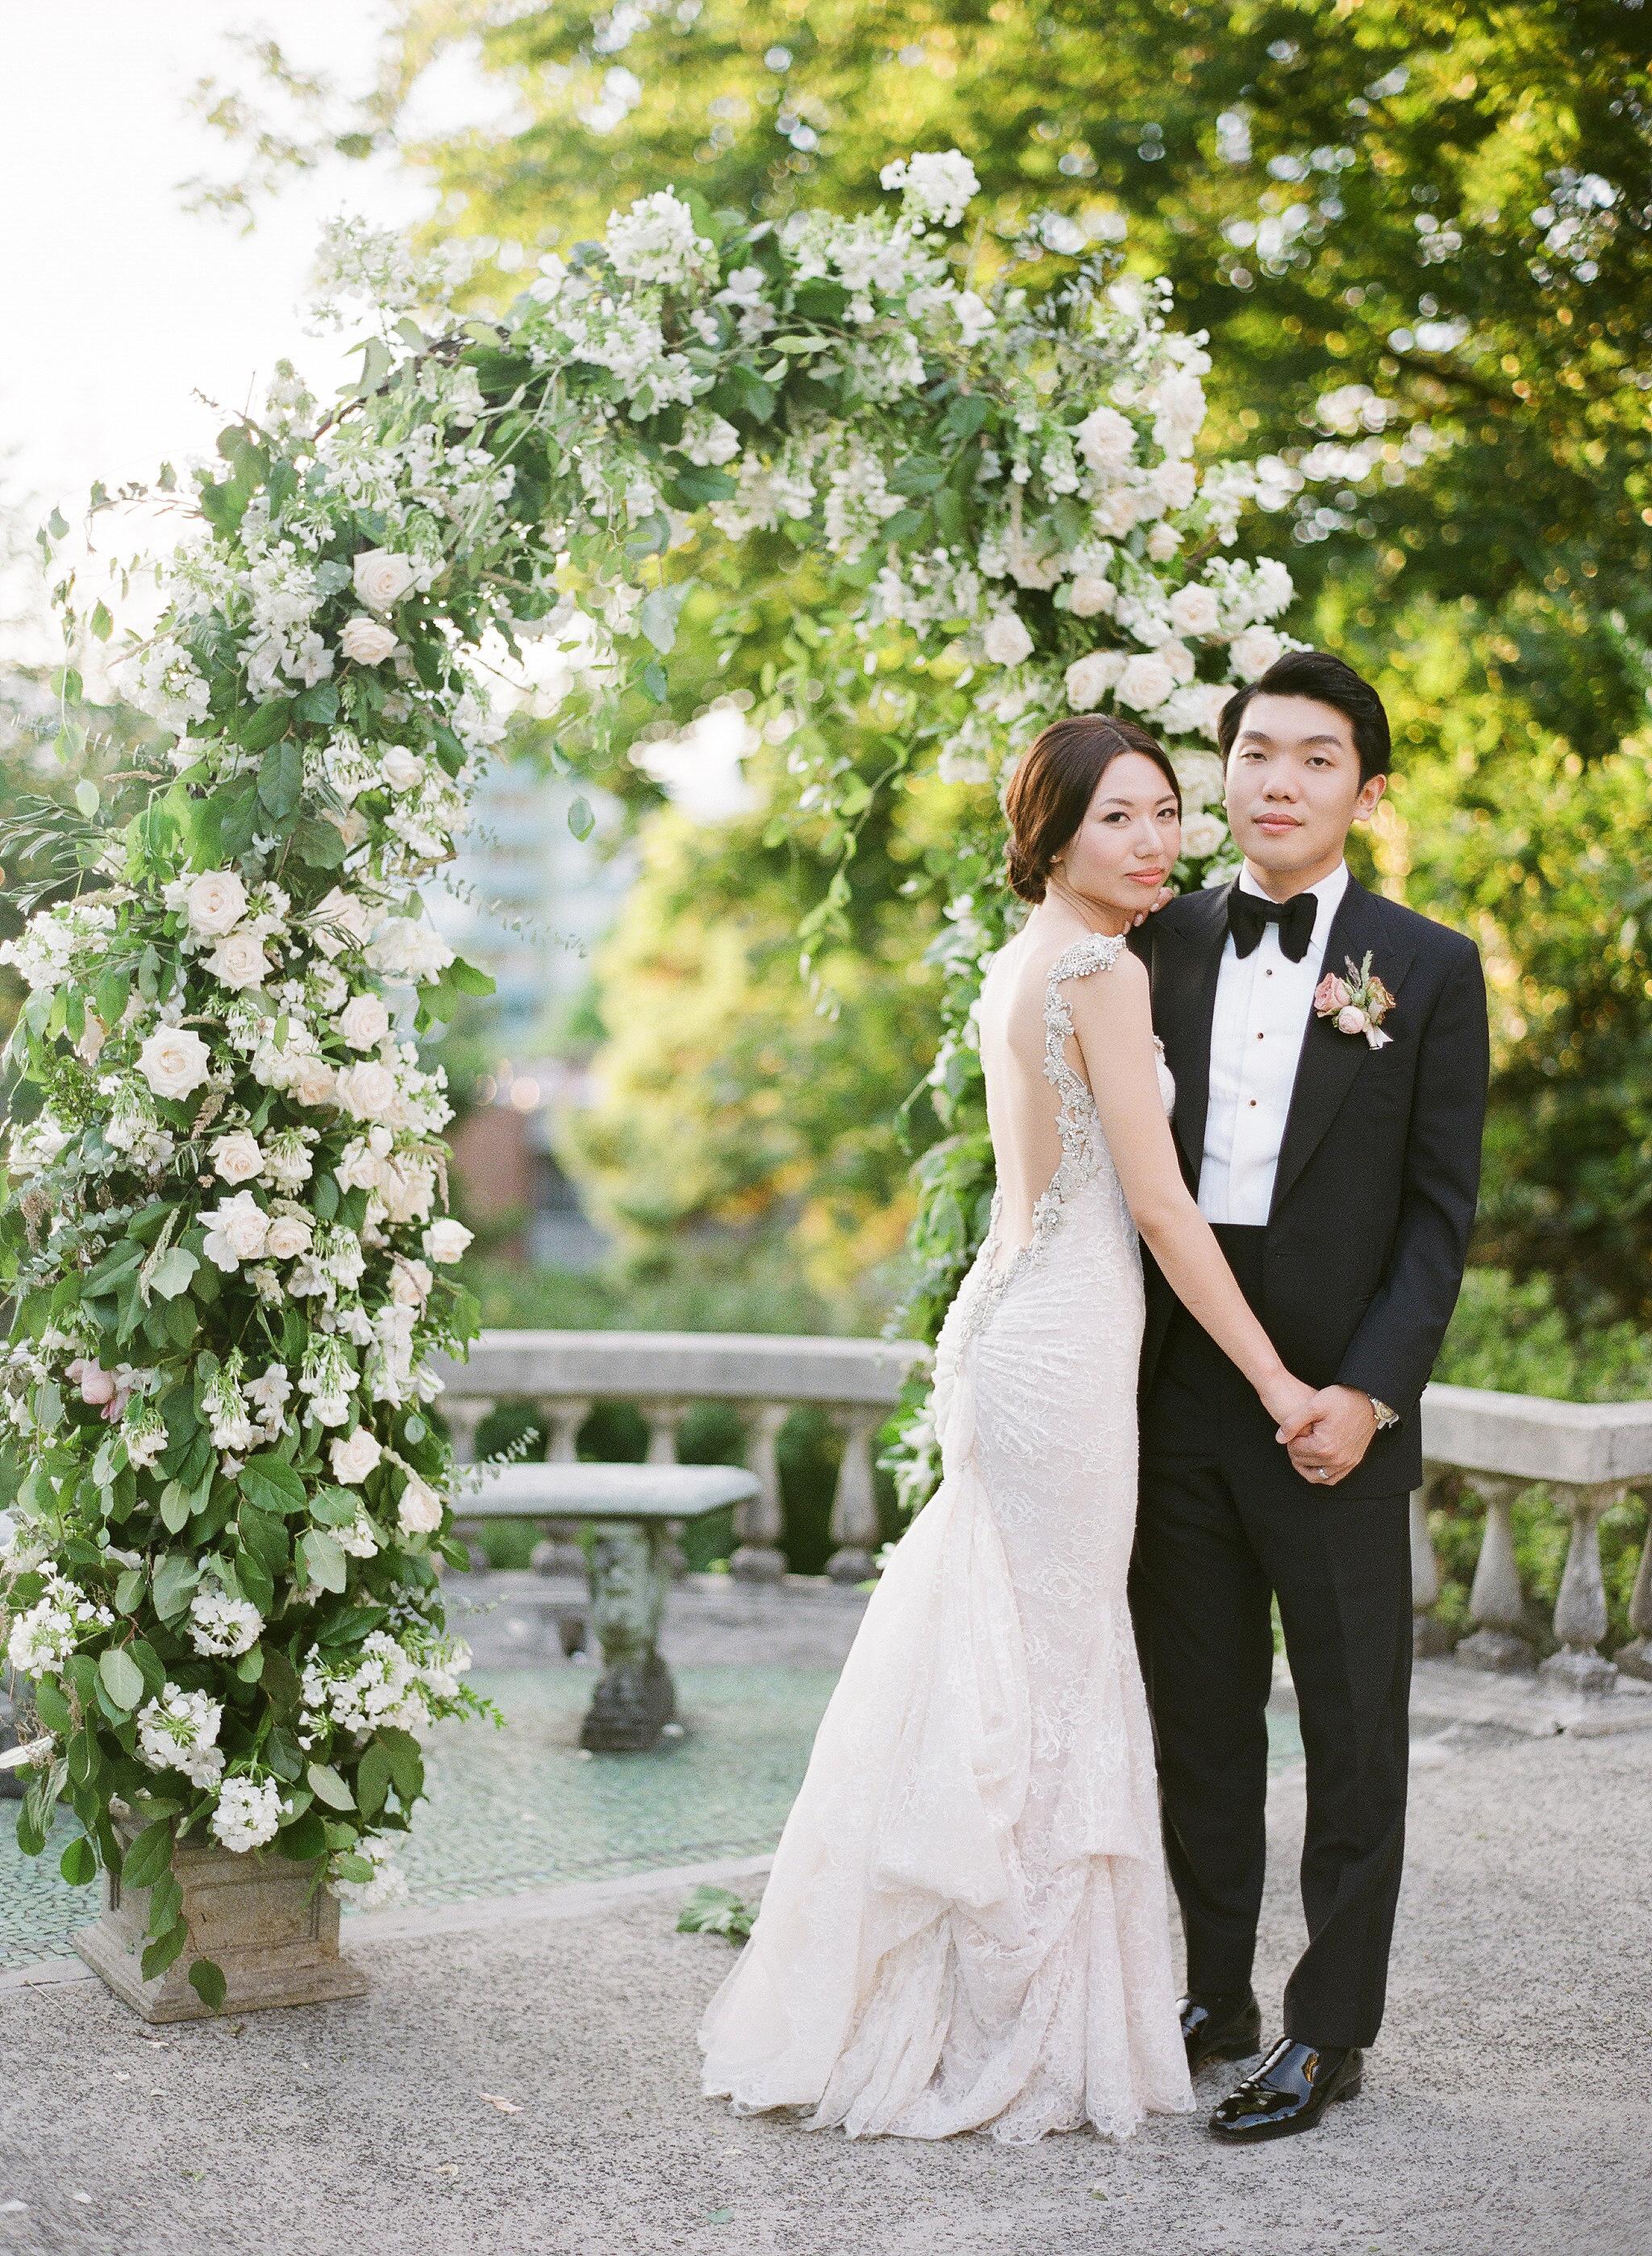 gloria zee wedding couple arch holding hands